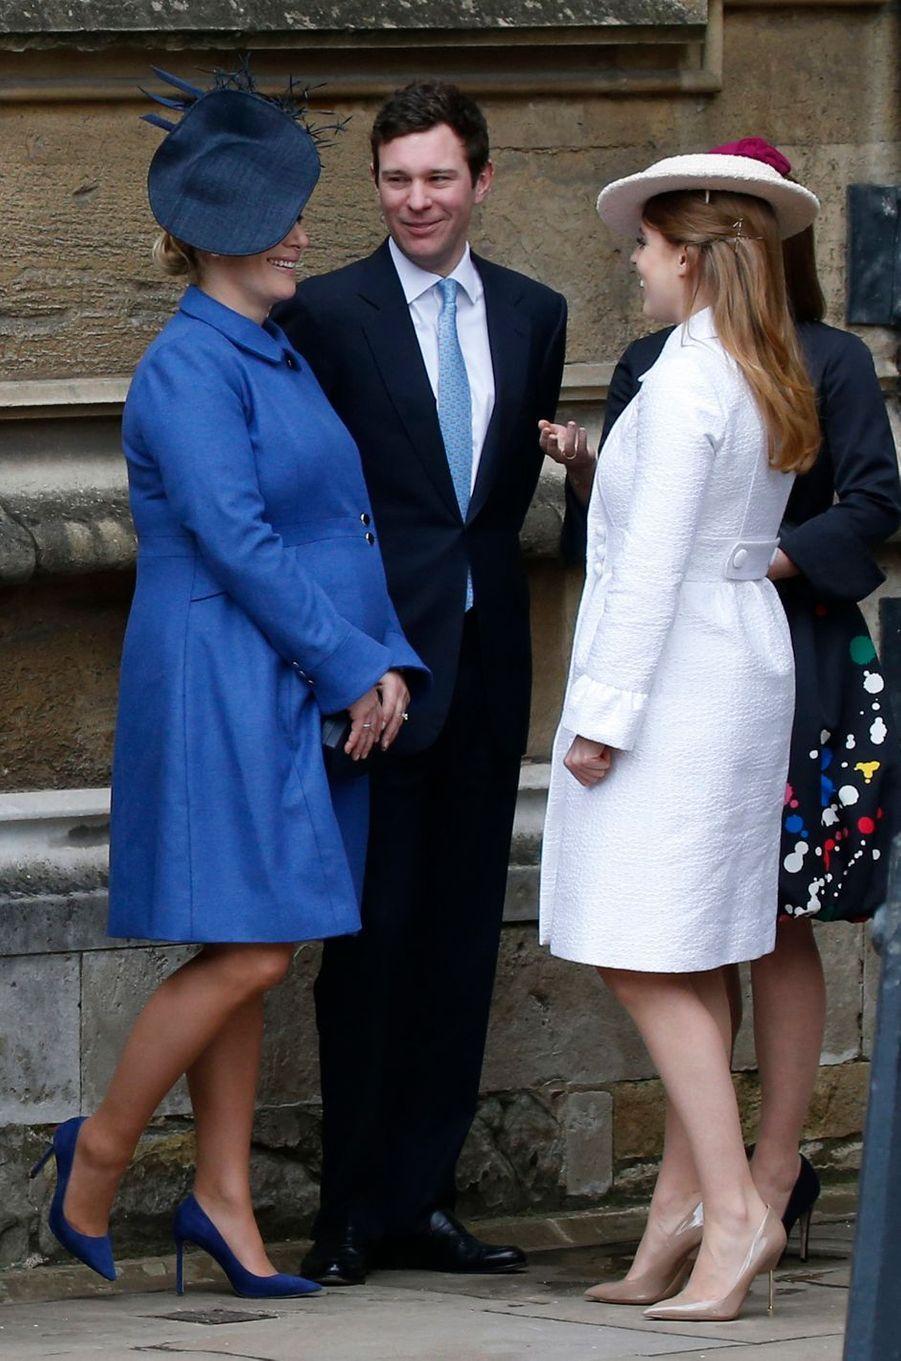 Zara Phillips et les princesses Beatrice et Eugenie d'York à Windsor, le 1er avril 2018